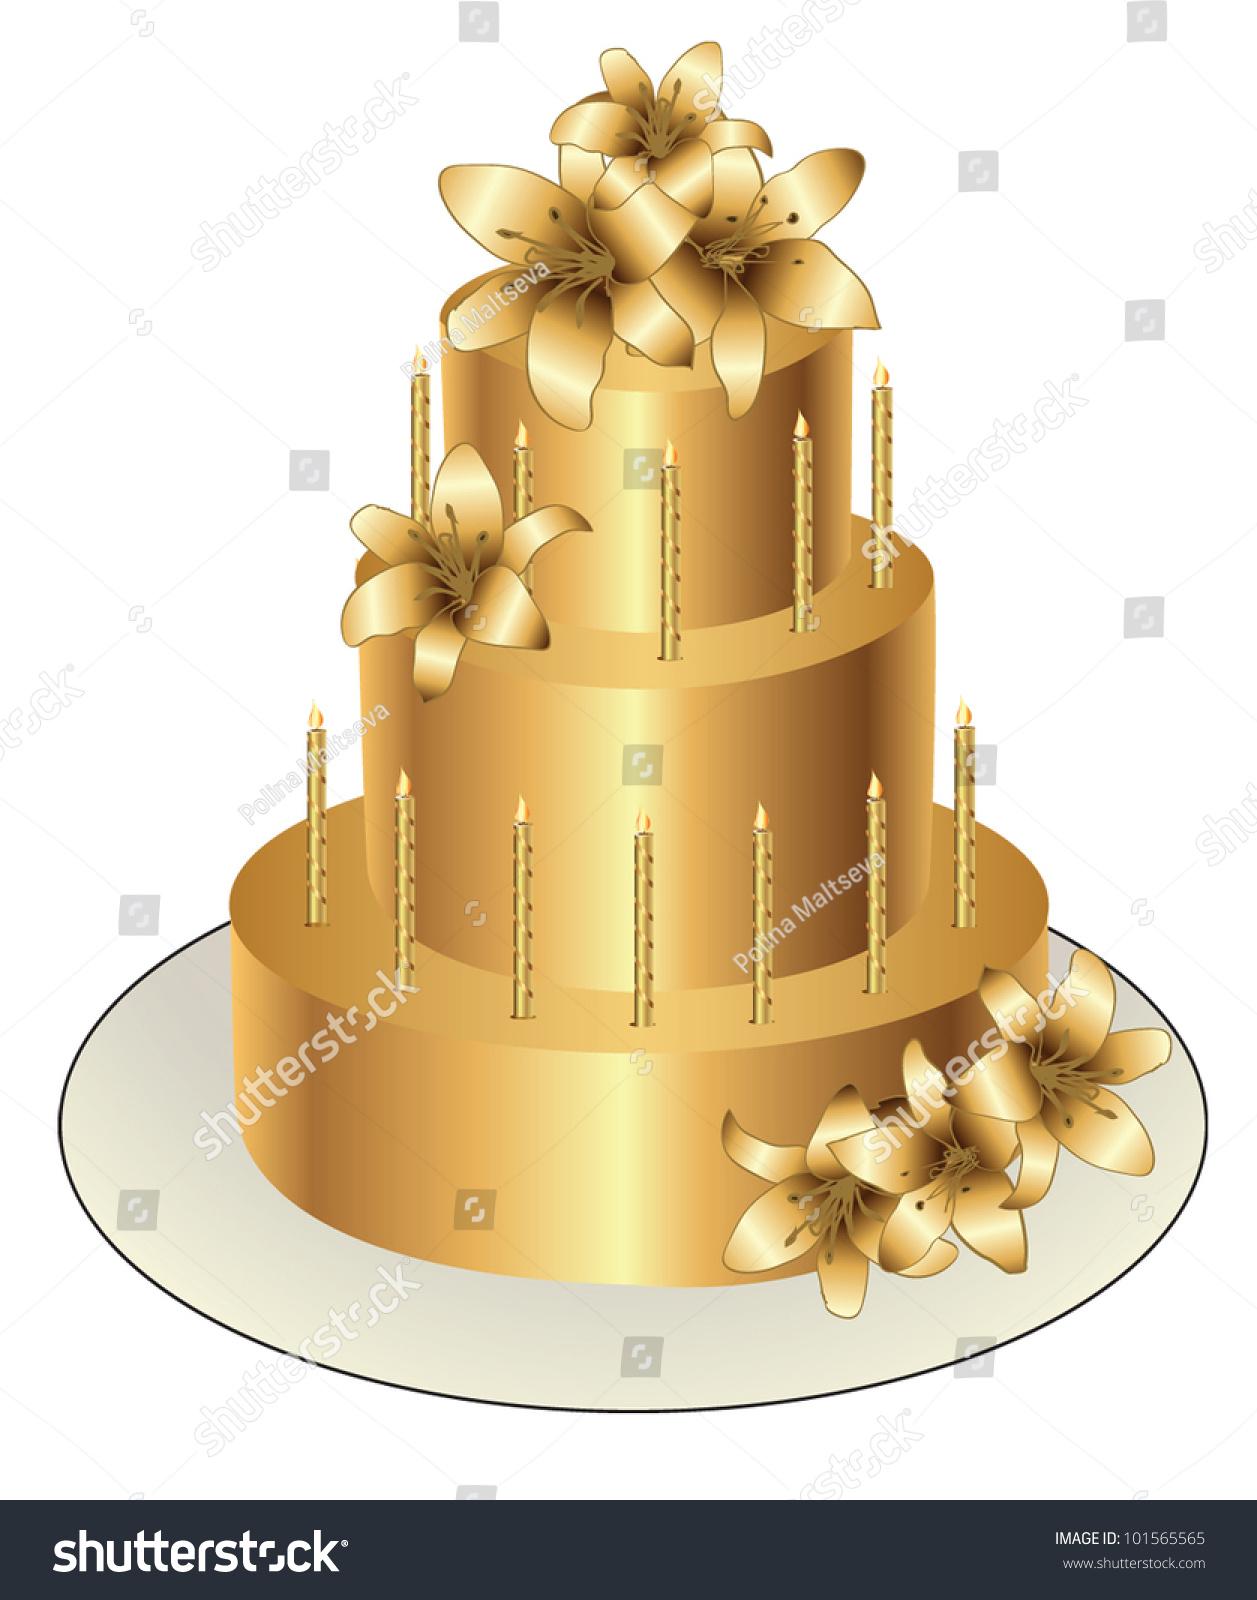 Gold Birthday Cake Vector Design Stock Vector Royalty Free